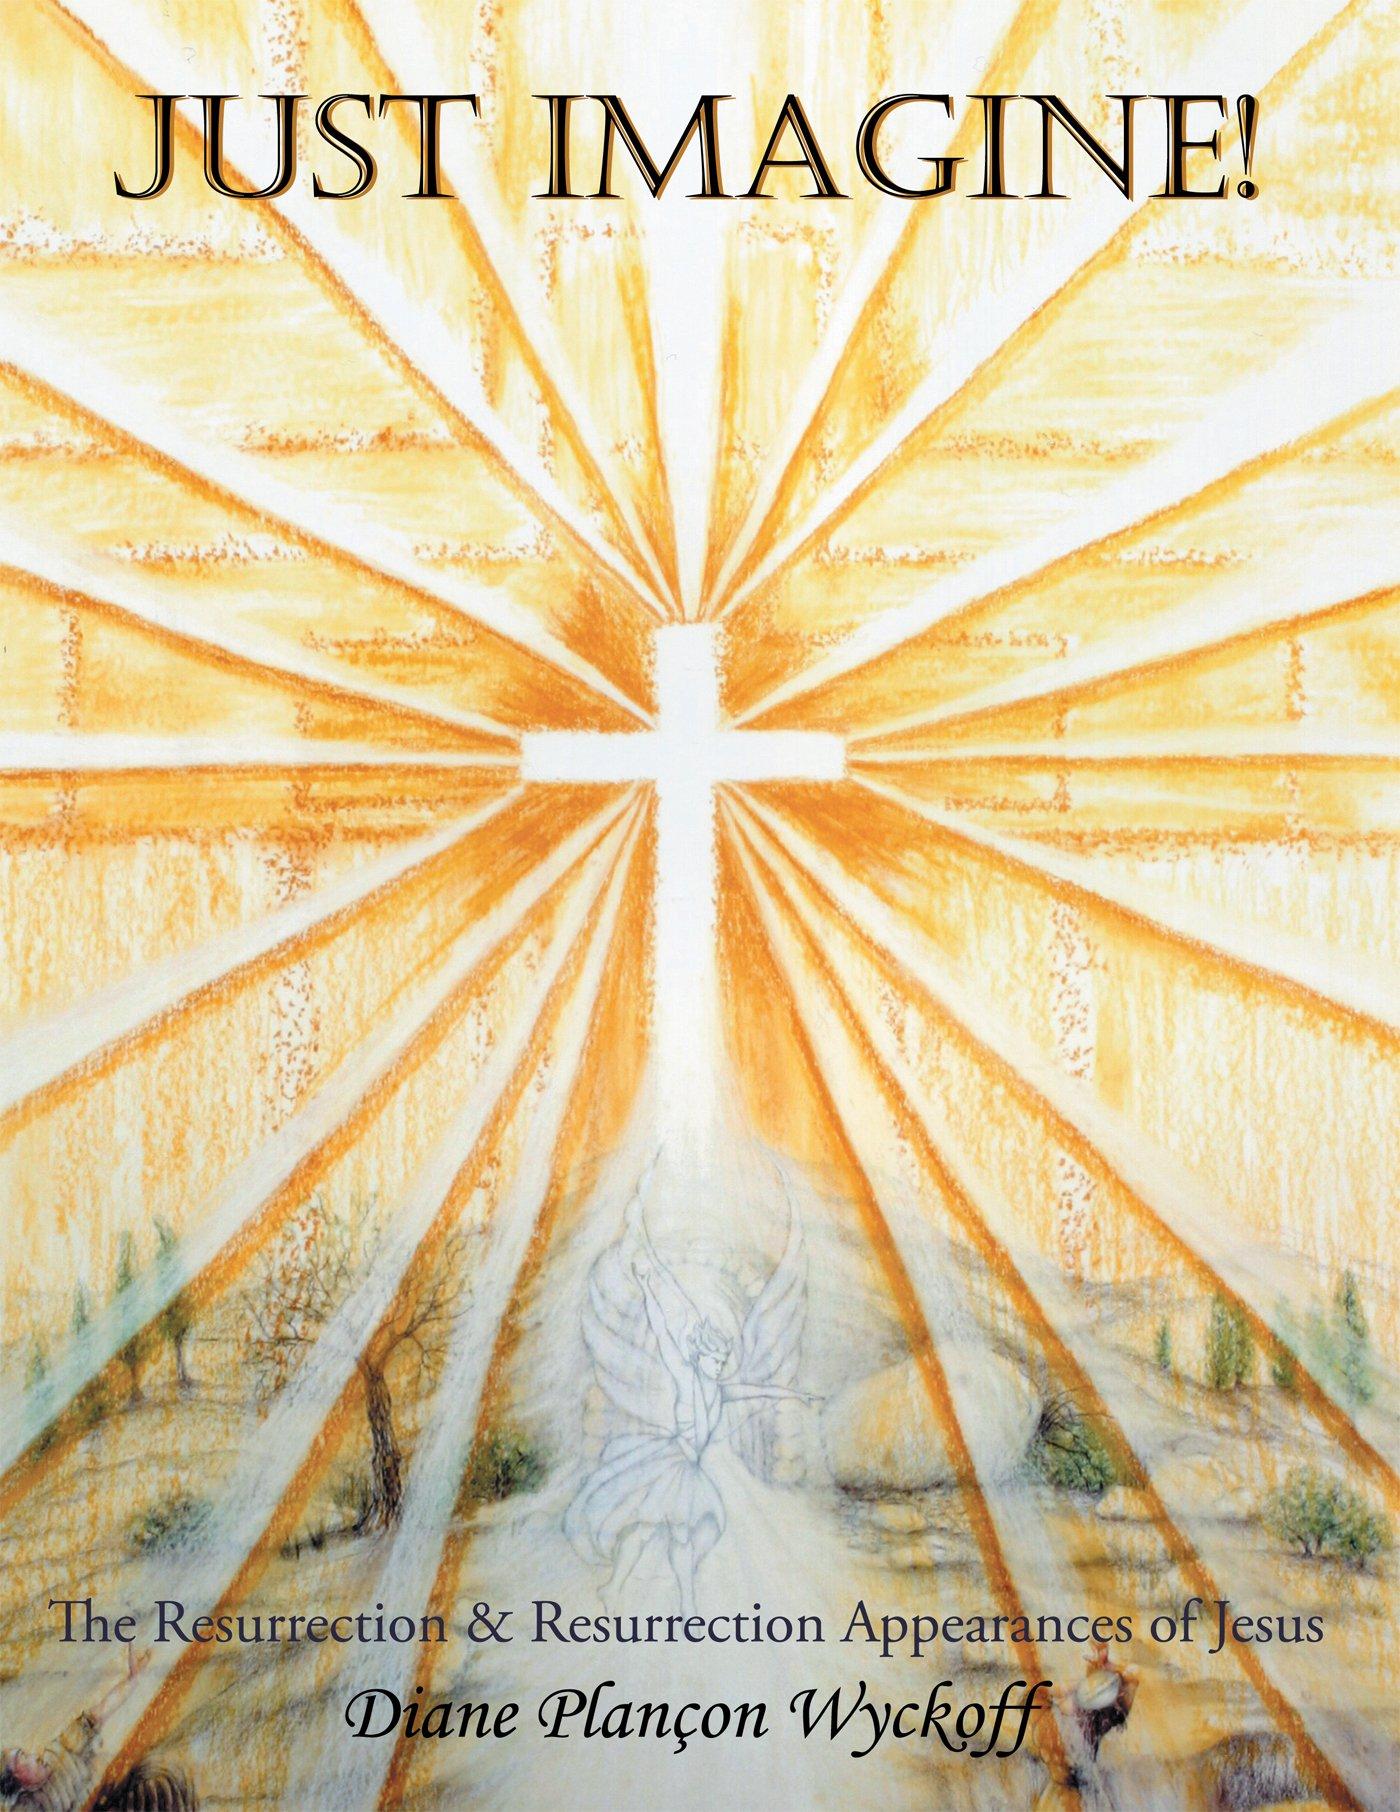 Just Imagine!: The Resurrection & Resurrection Appearances of Jesus